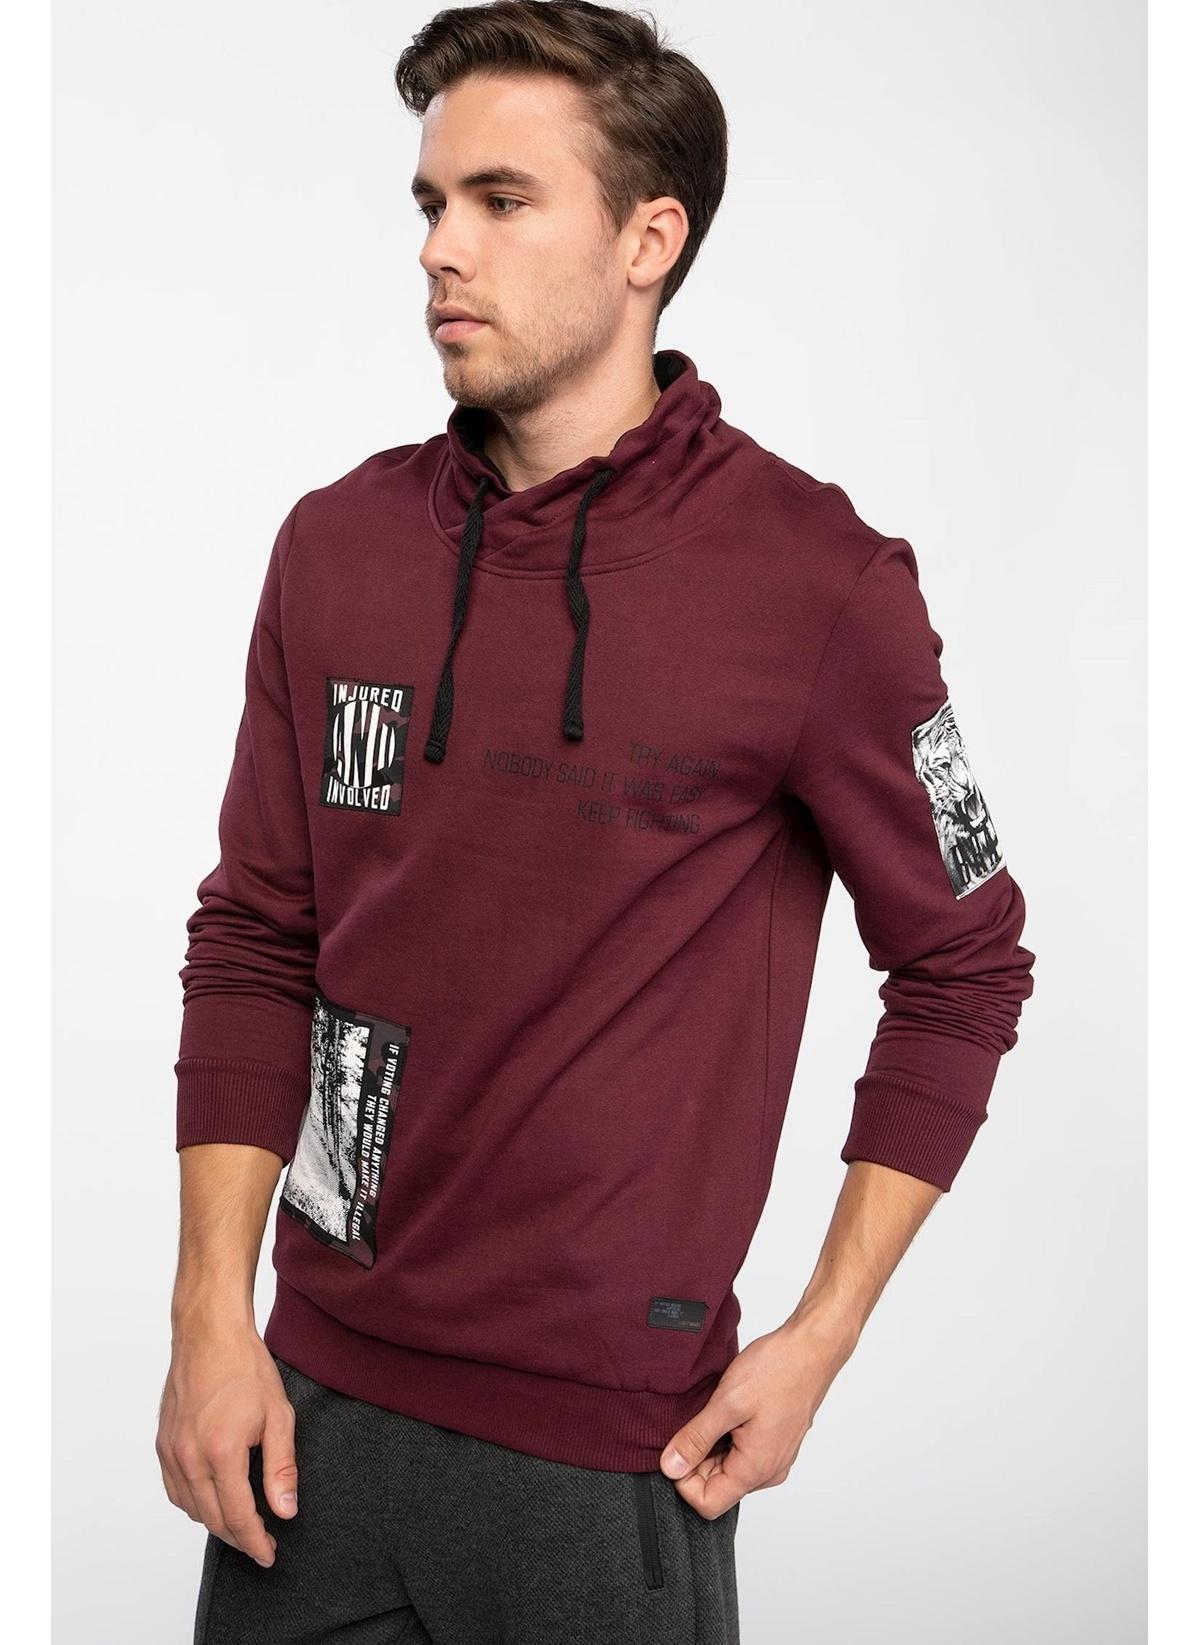 Defacto Degaje Yaka Sweatshirt J2954az18wnbr34 Sweatshirt – 69.99 TL